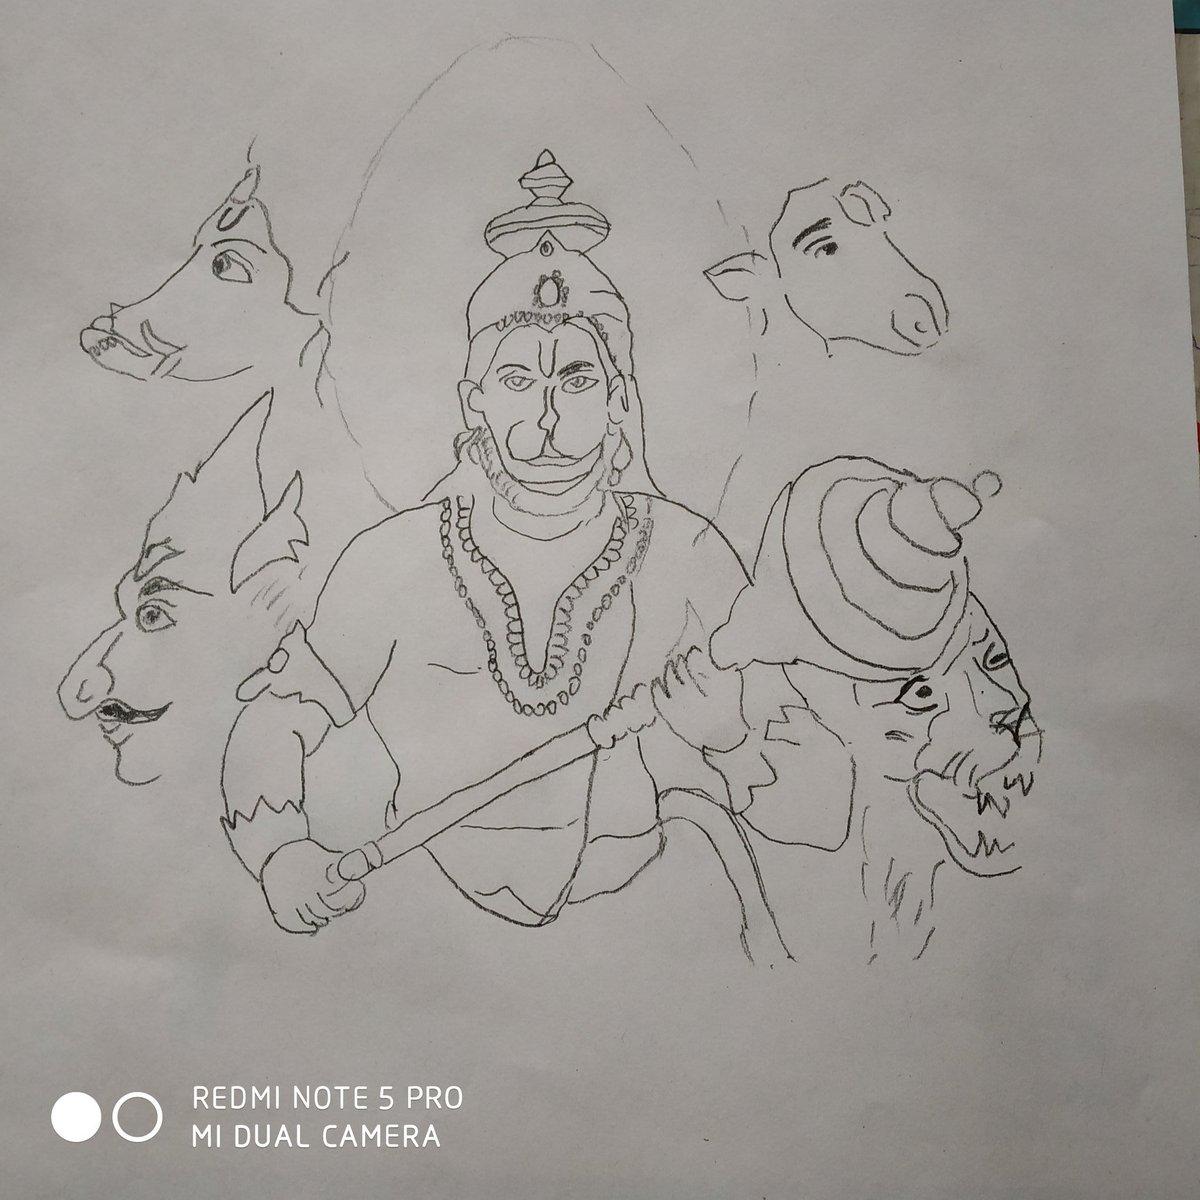 Kalyug ka krishan on twitter karanacharya7 bhai my attempt to draw panchmukhi hanuman ji this diwali please have a look pencil sketch and thn